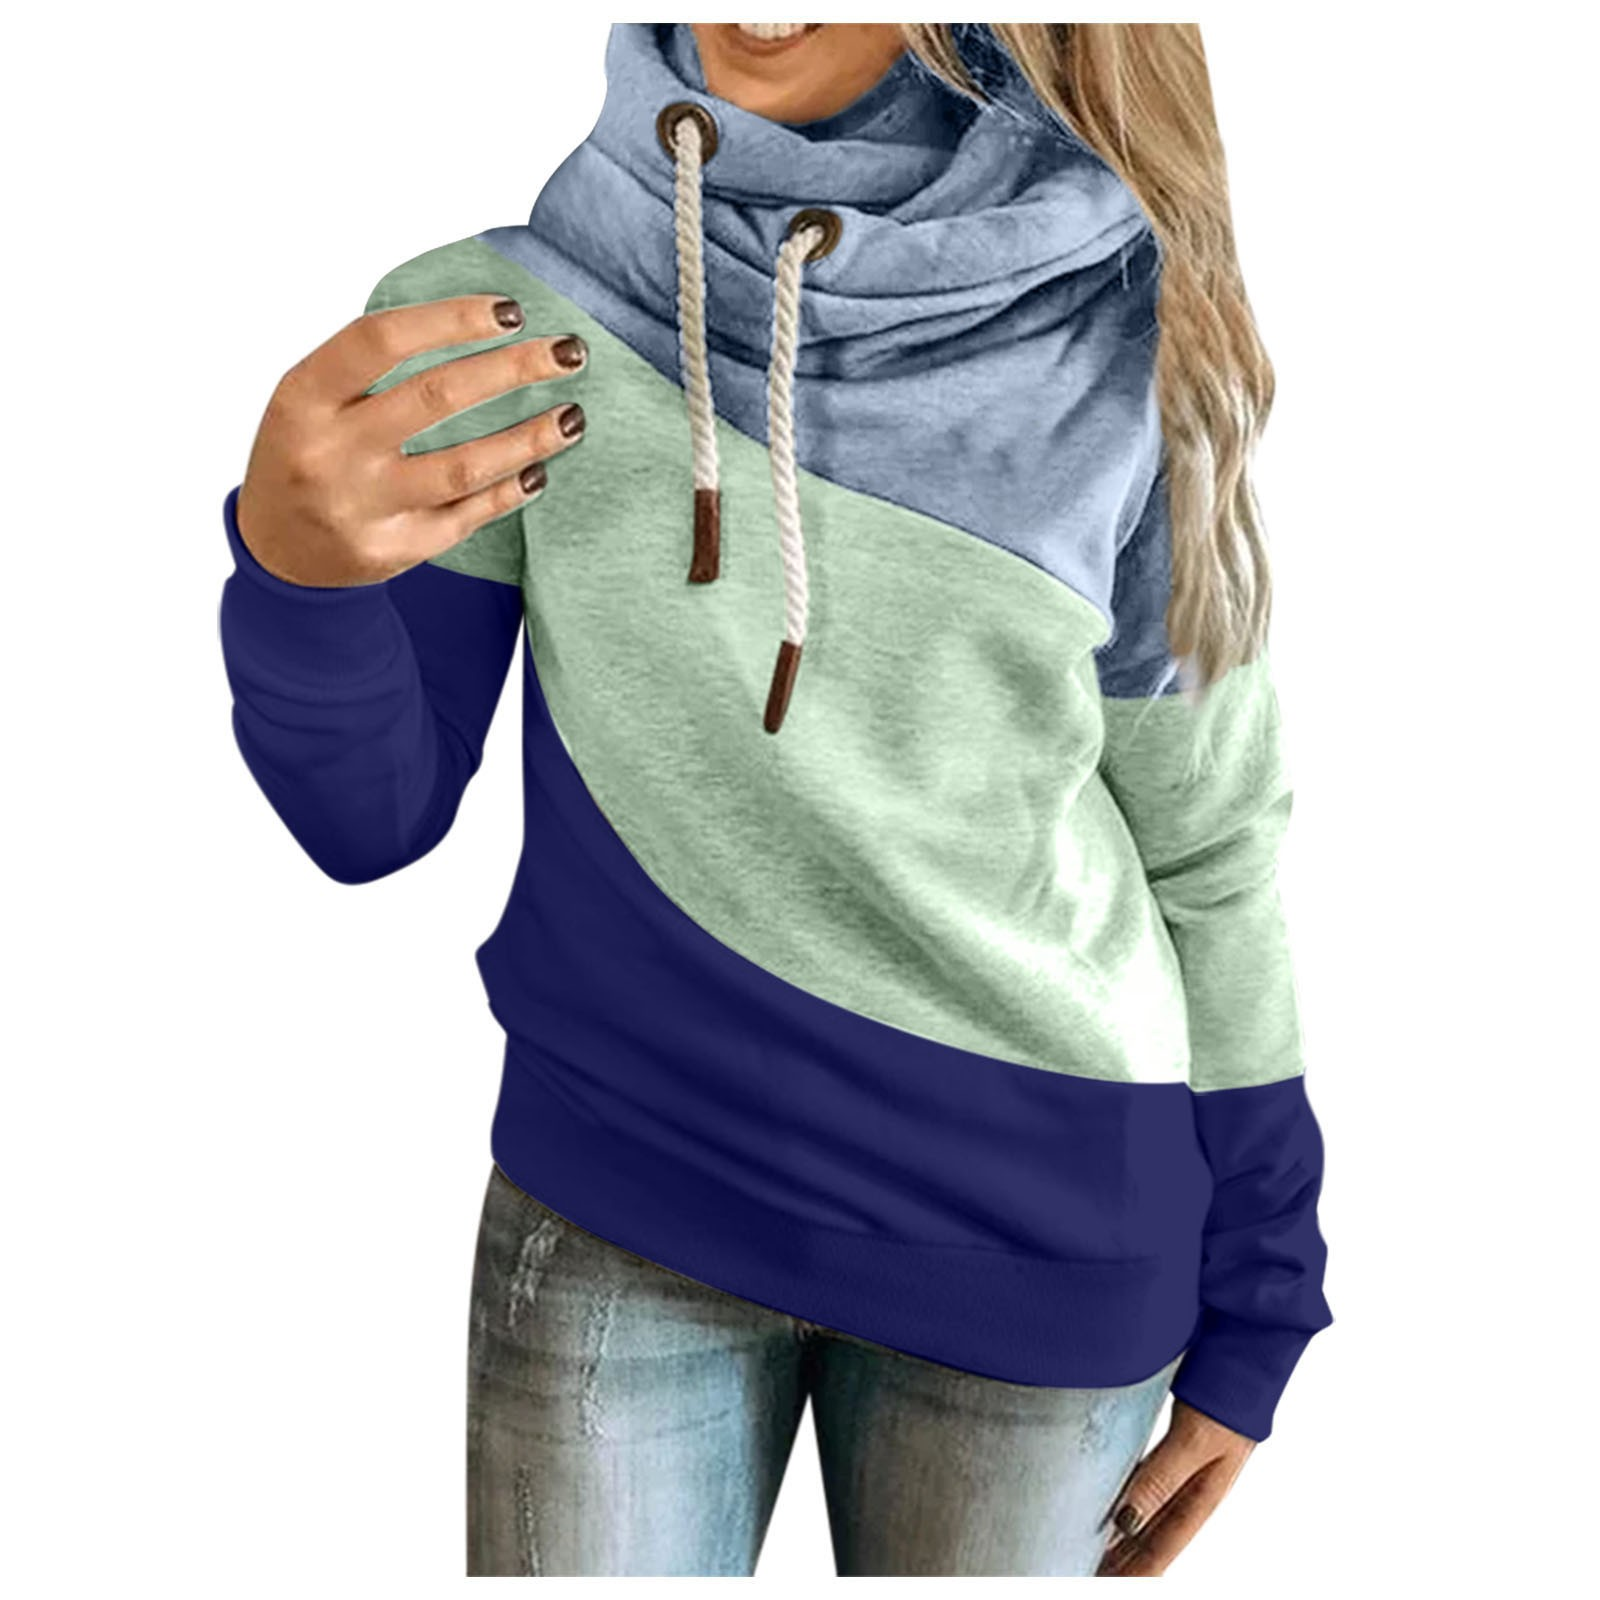 Female Hoodies Women Oversized Sweatshirts Autumn Winter Contrast Stitching Long Sleeve Pullover Top Warm Women's Clothing#LR2 2